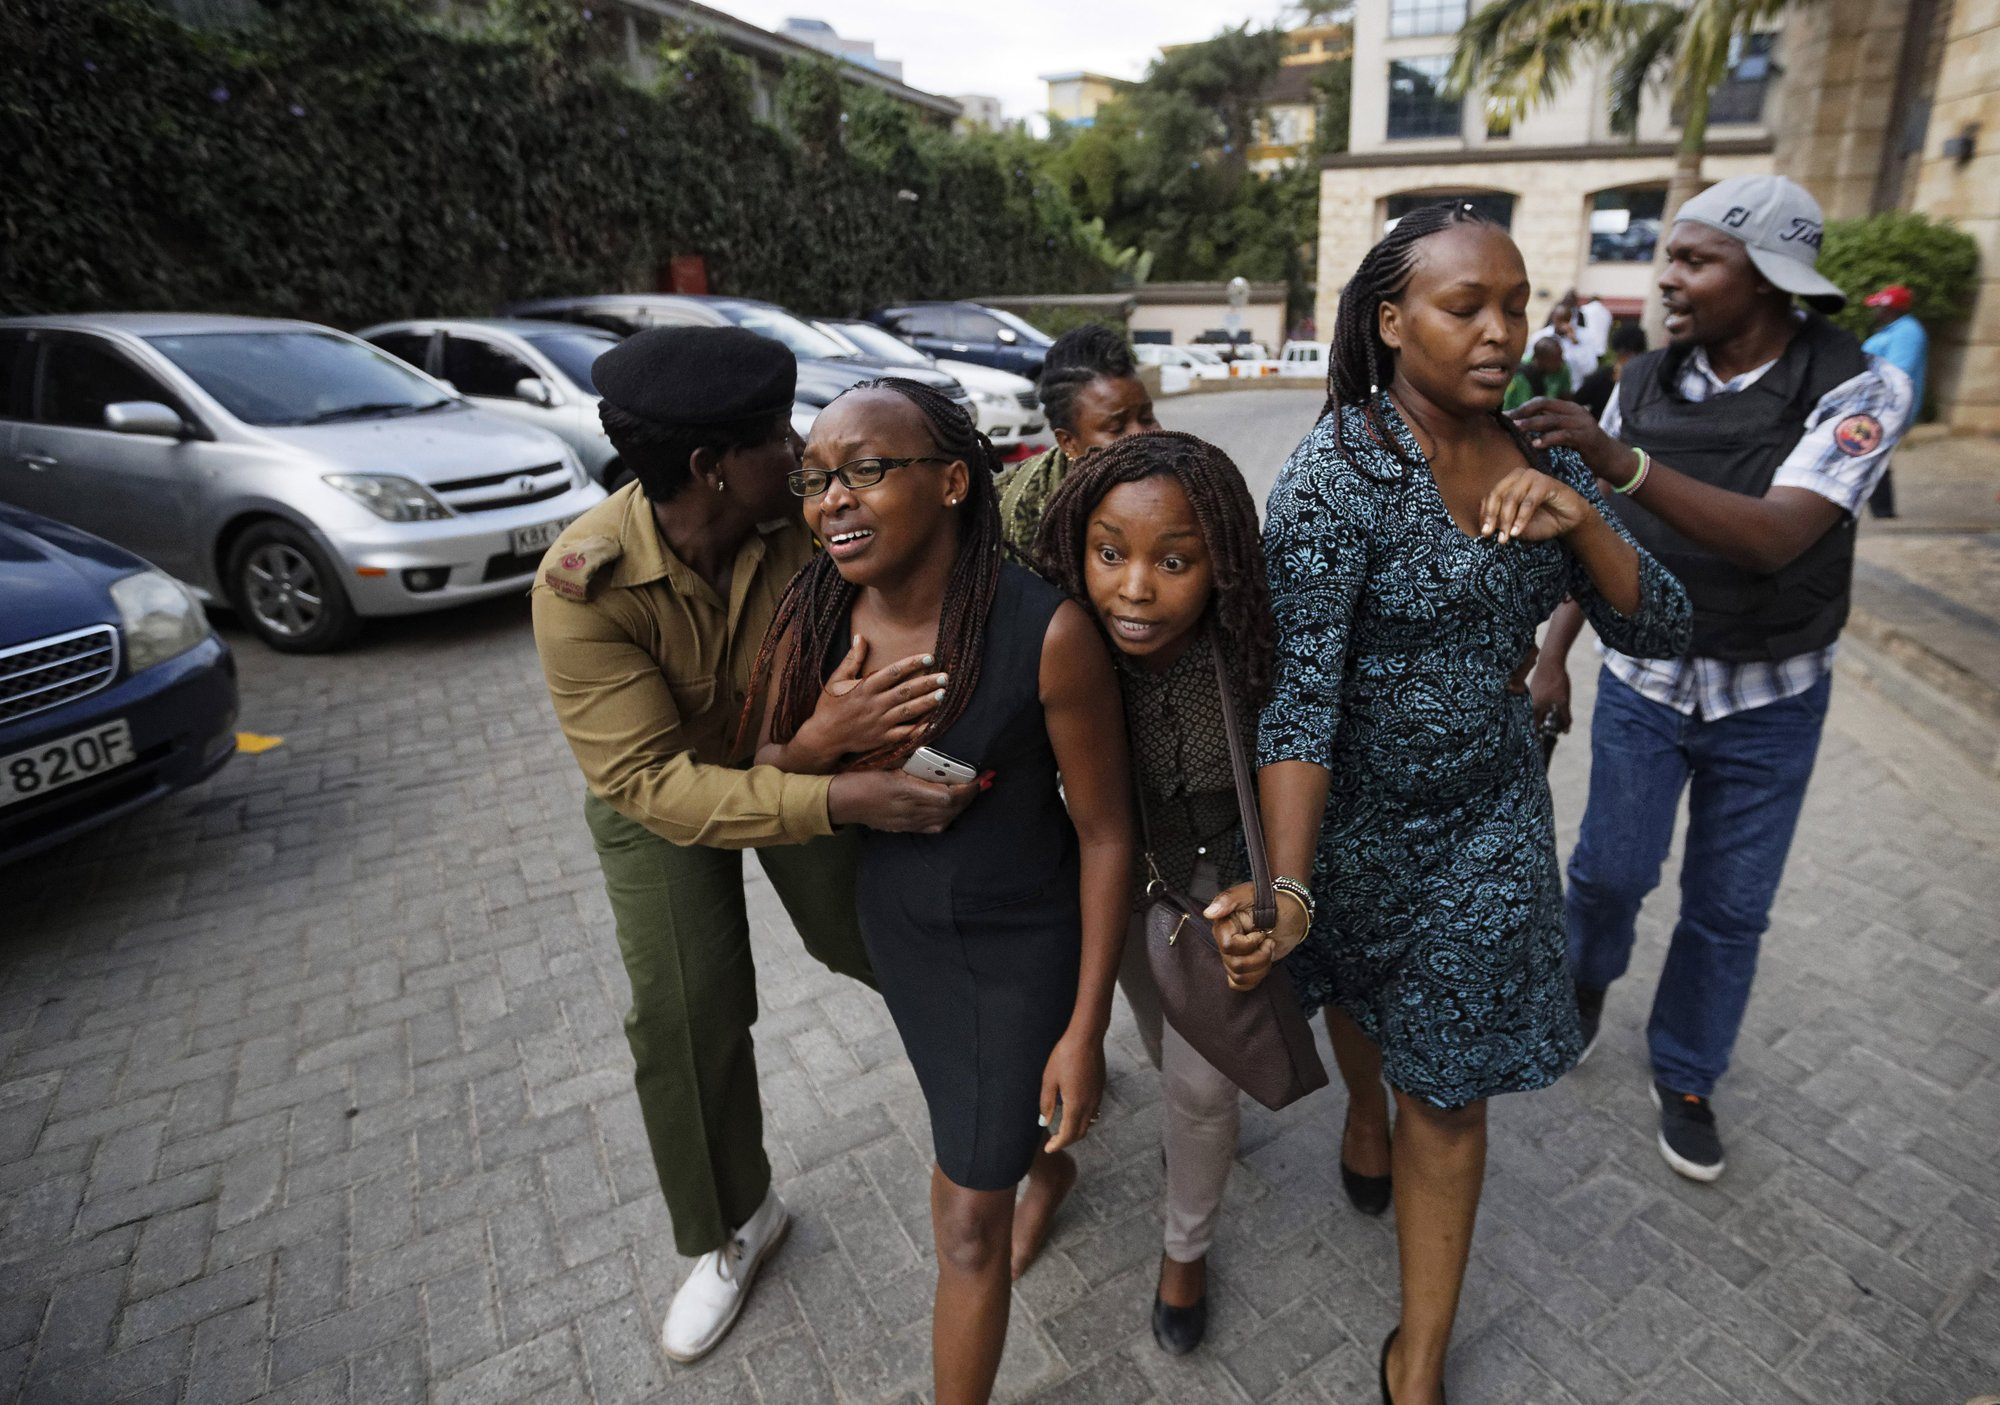 Civilians flee the scene at a hotel complex in Nairobi, Kenya on Tuesday, Jan. 15, 2019. Photo: AP